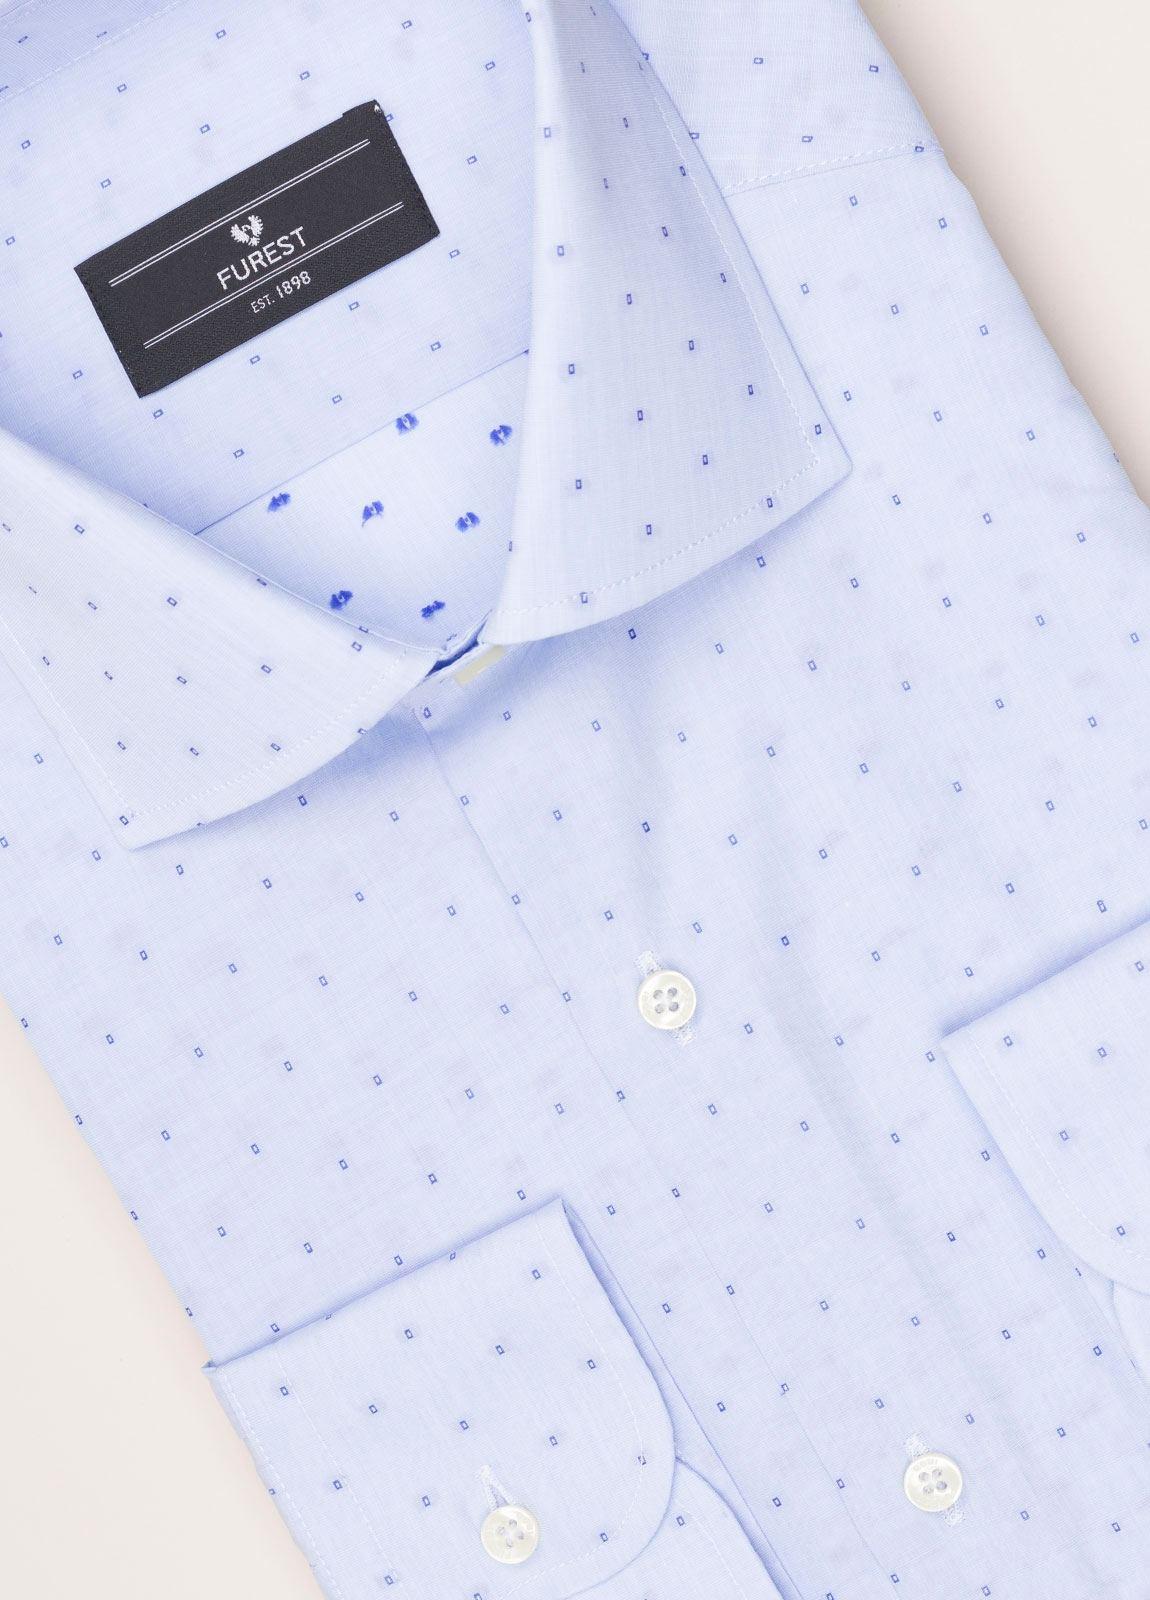 Camisa vestir FUREST COLECCIÓN REGULAR FIT fil coupé celeste - Ítem1